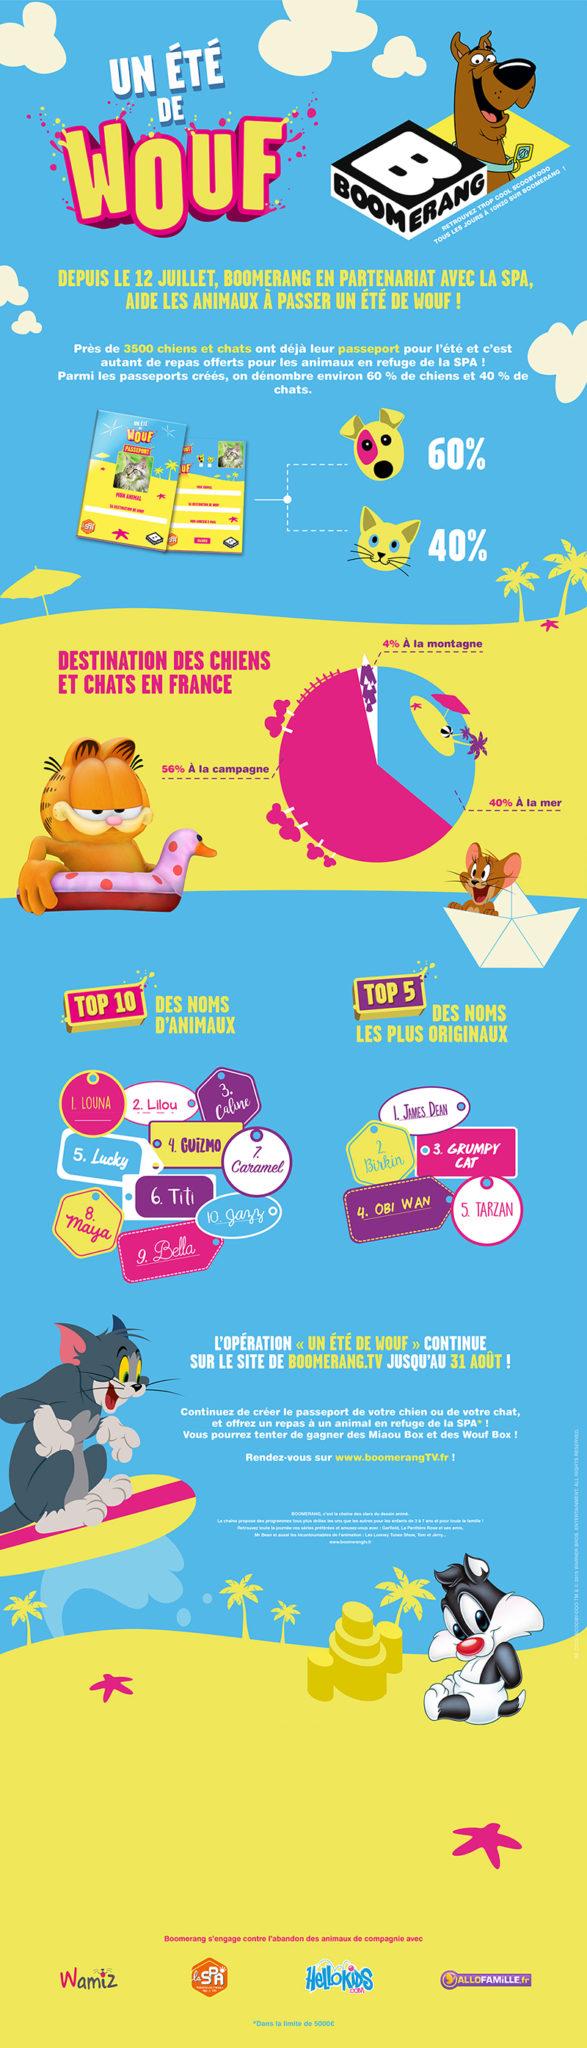 infographie-un-ete-de-wouf-boomerangtv-presse